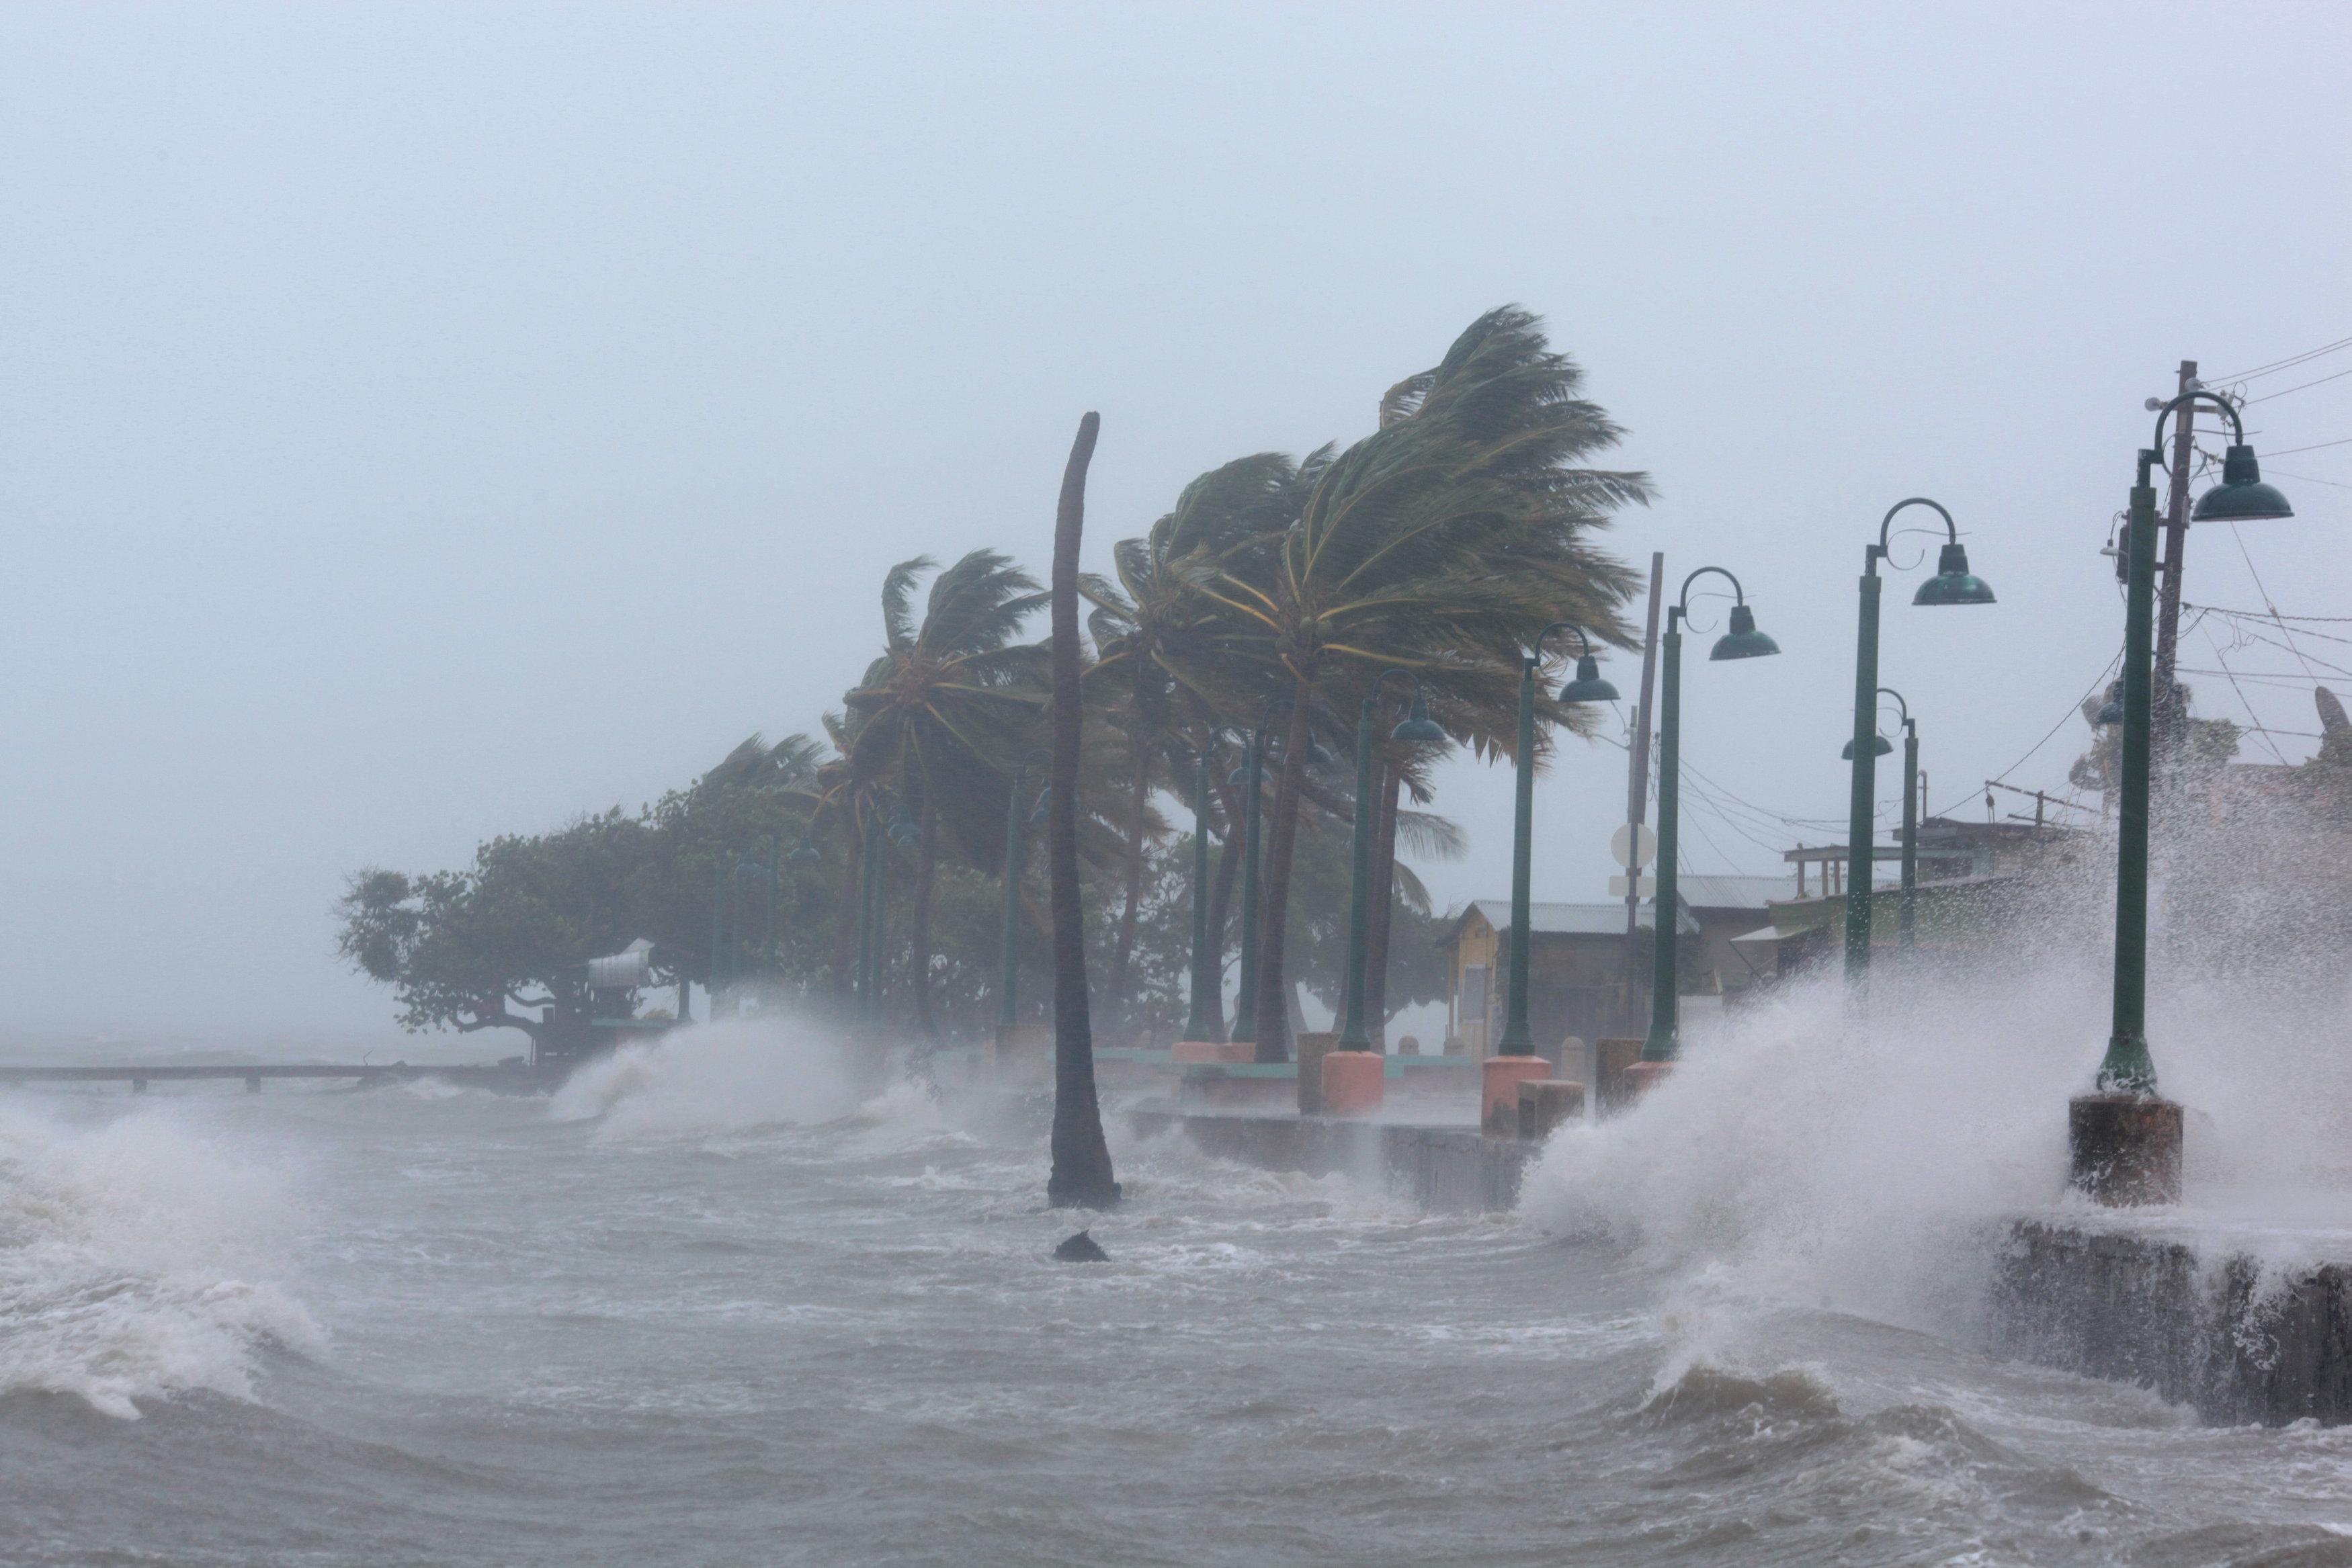 Waves crash against the seawall  in Fajardo, Puerto Rico. (REUTERS/Alvin Baez)